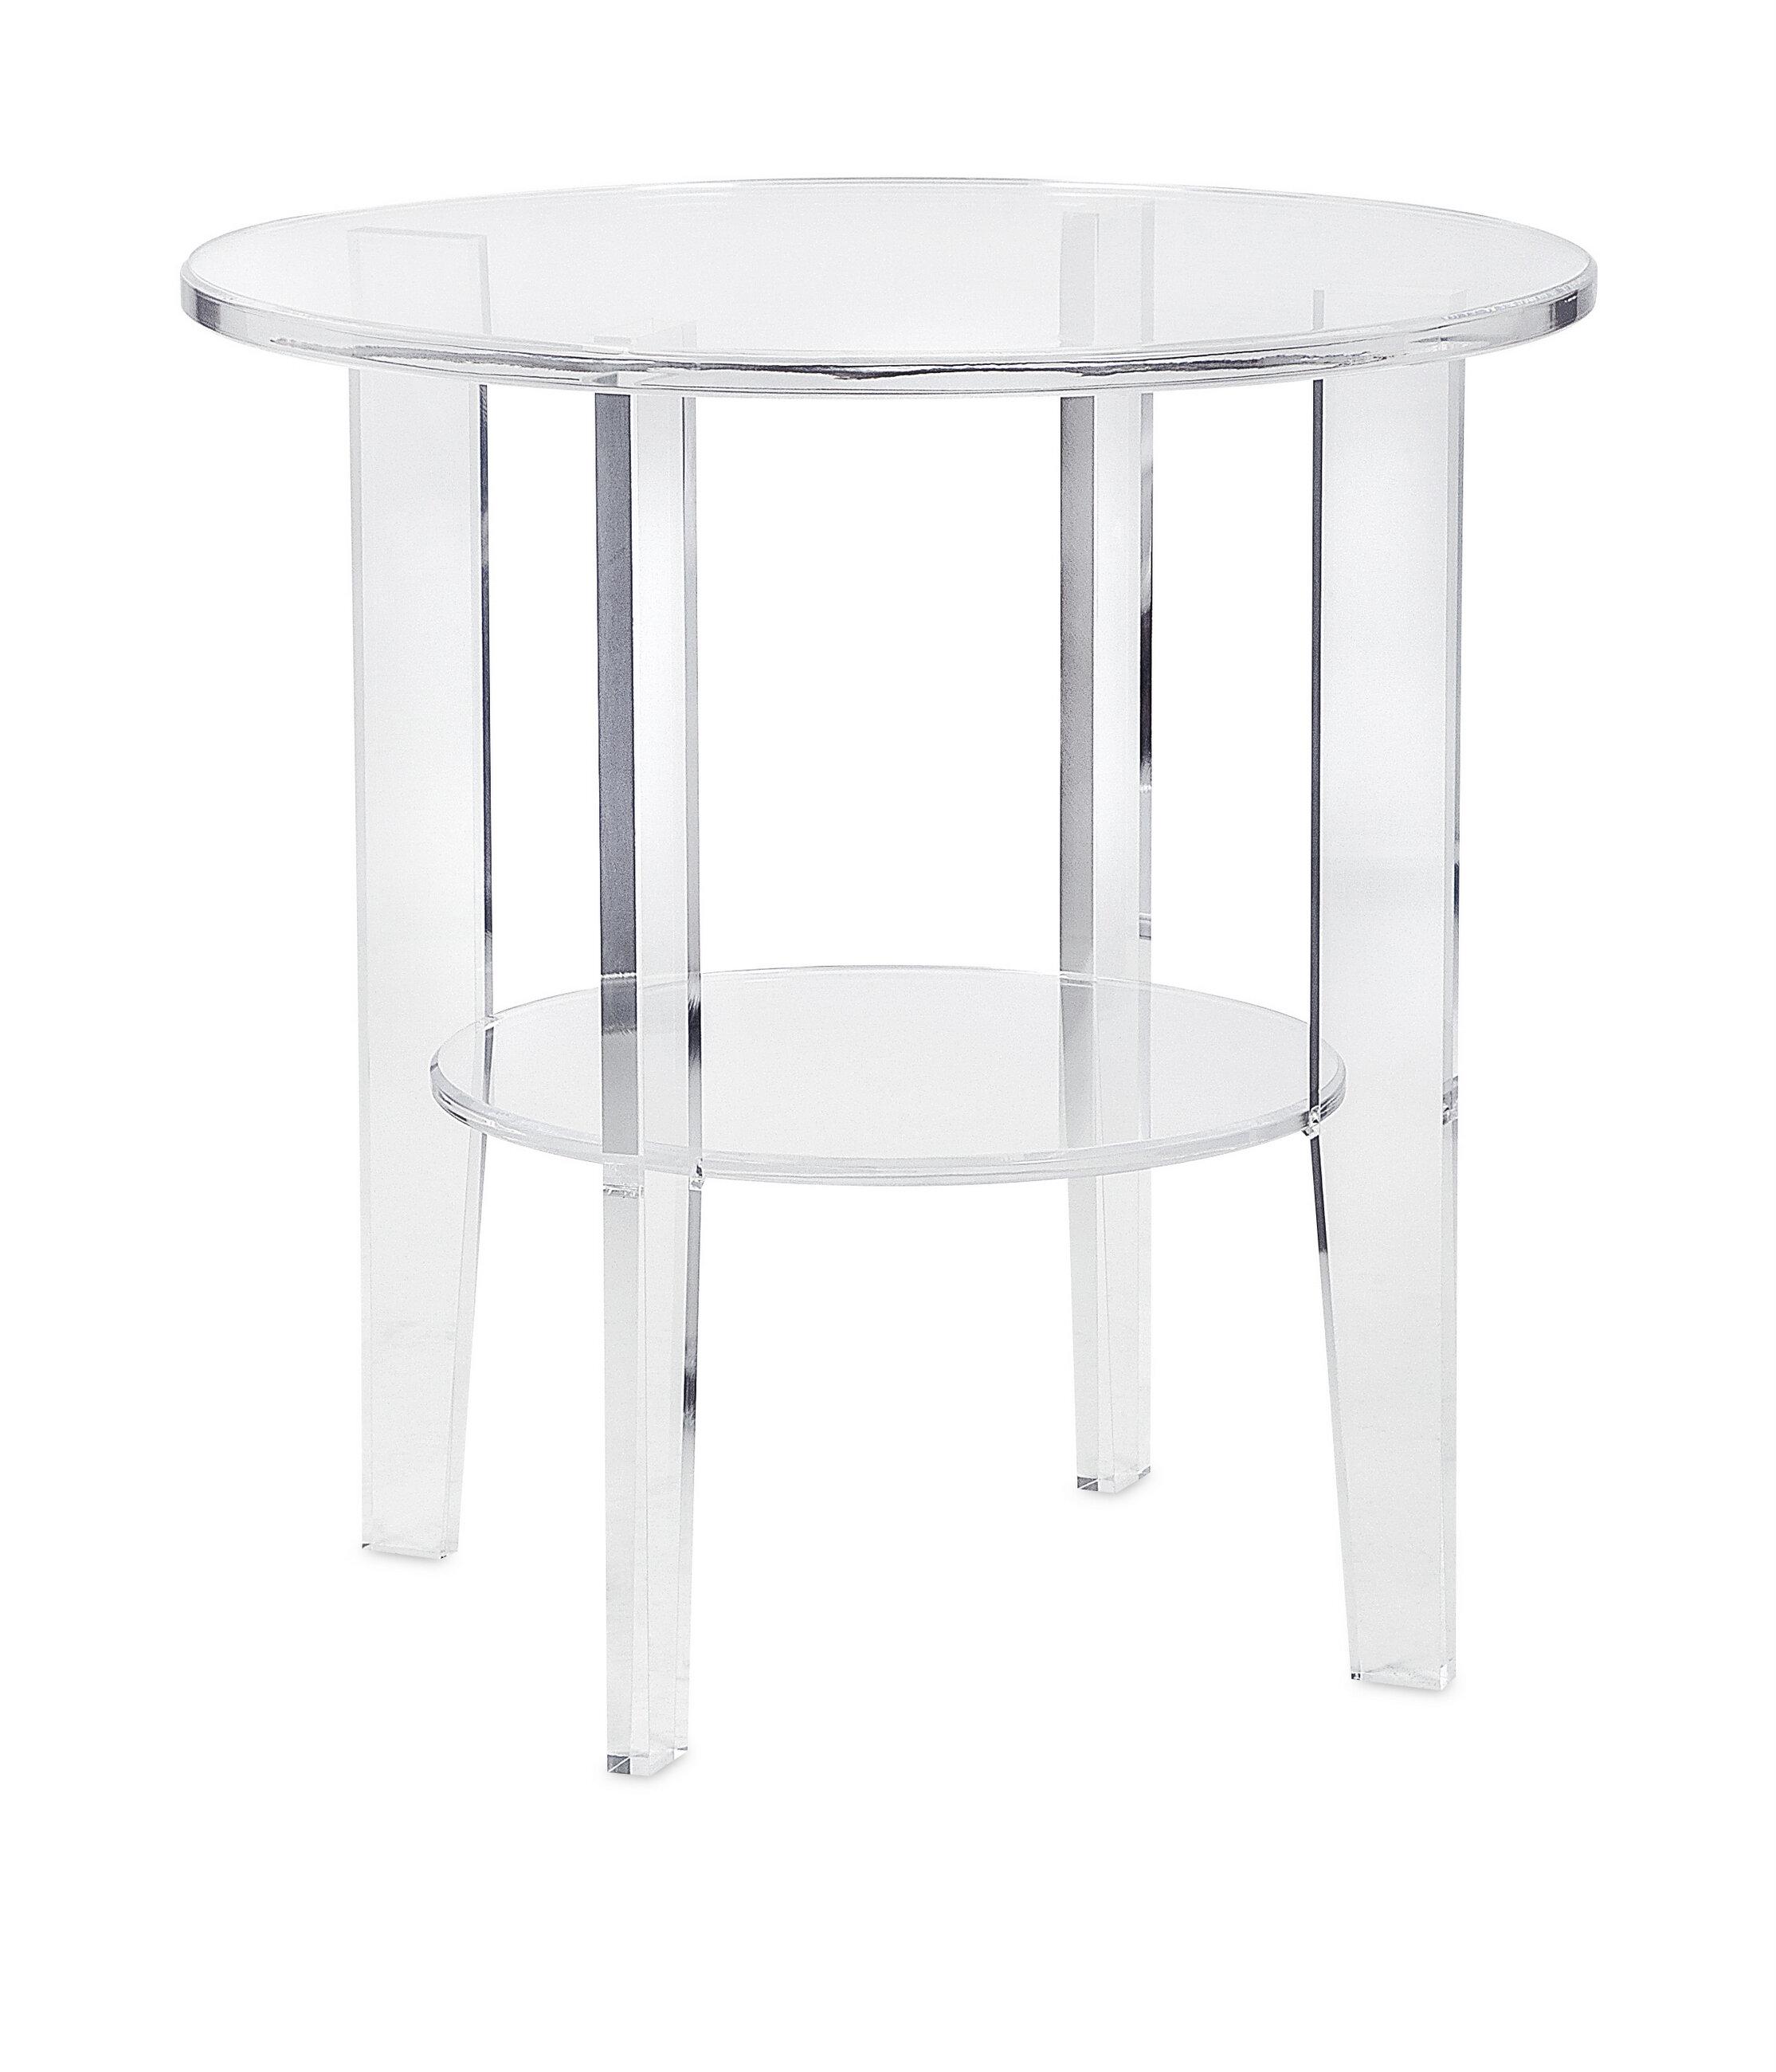 Acrylic Outdoor Furniture Aluminum Deck Allmodern Rosdorf Park Boykin Striking Acrylic End Table Wayfair